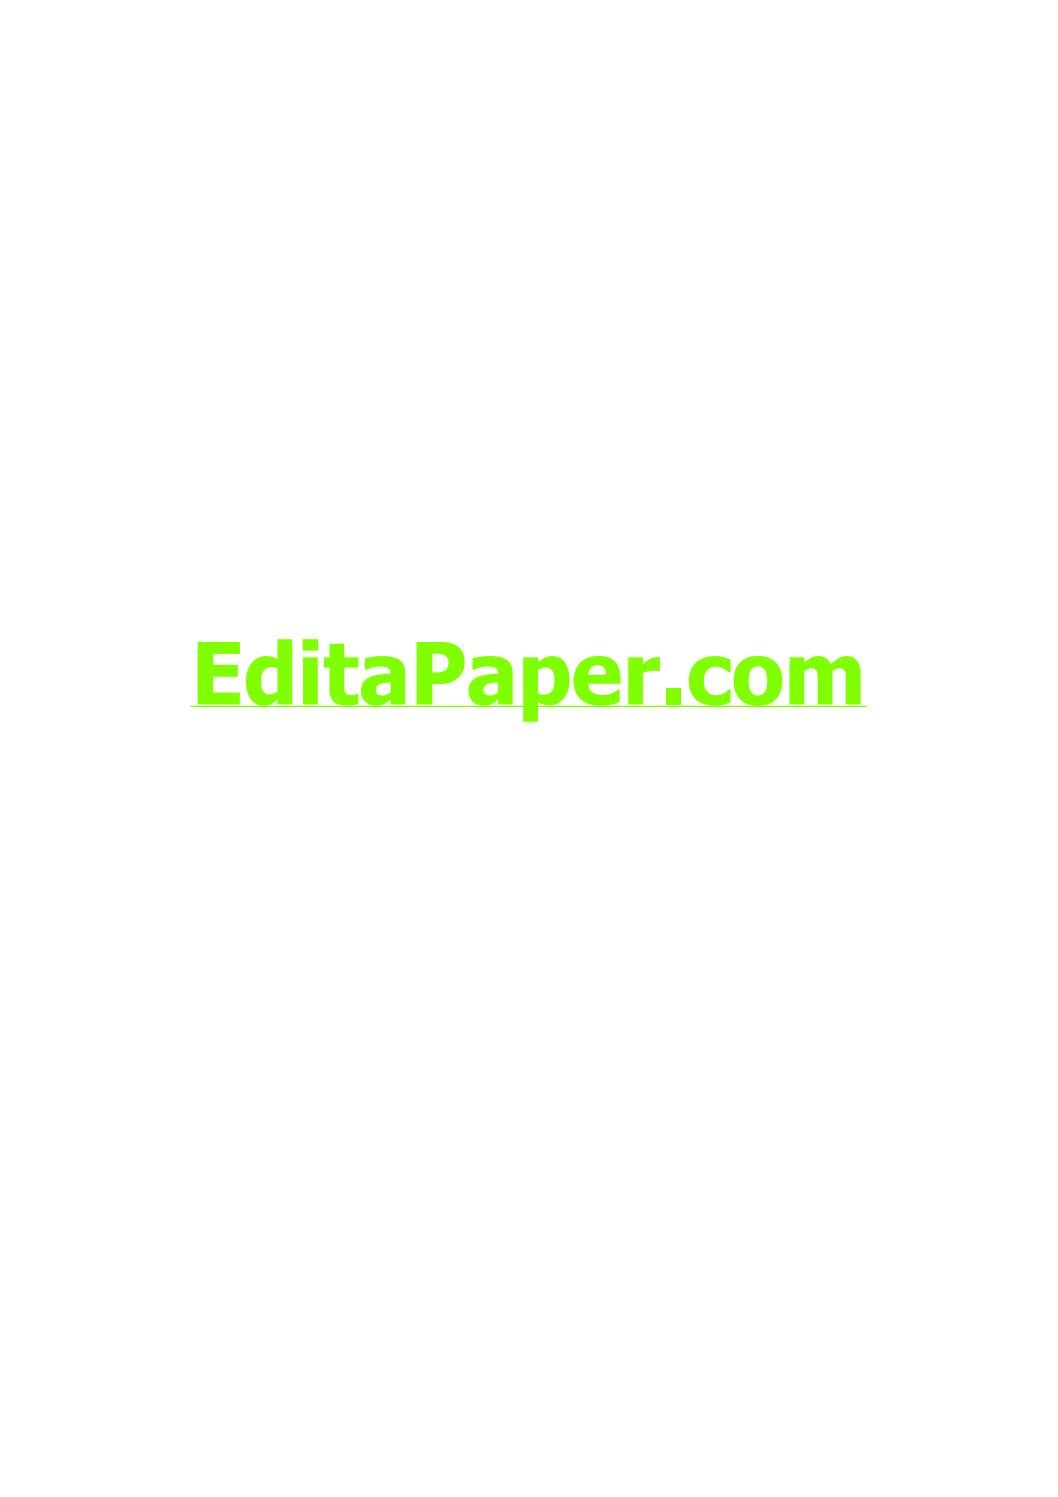 Literature review write dissertation